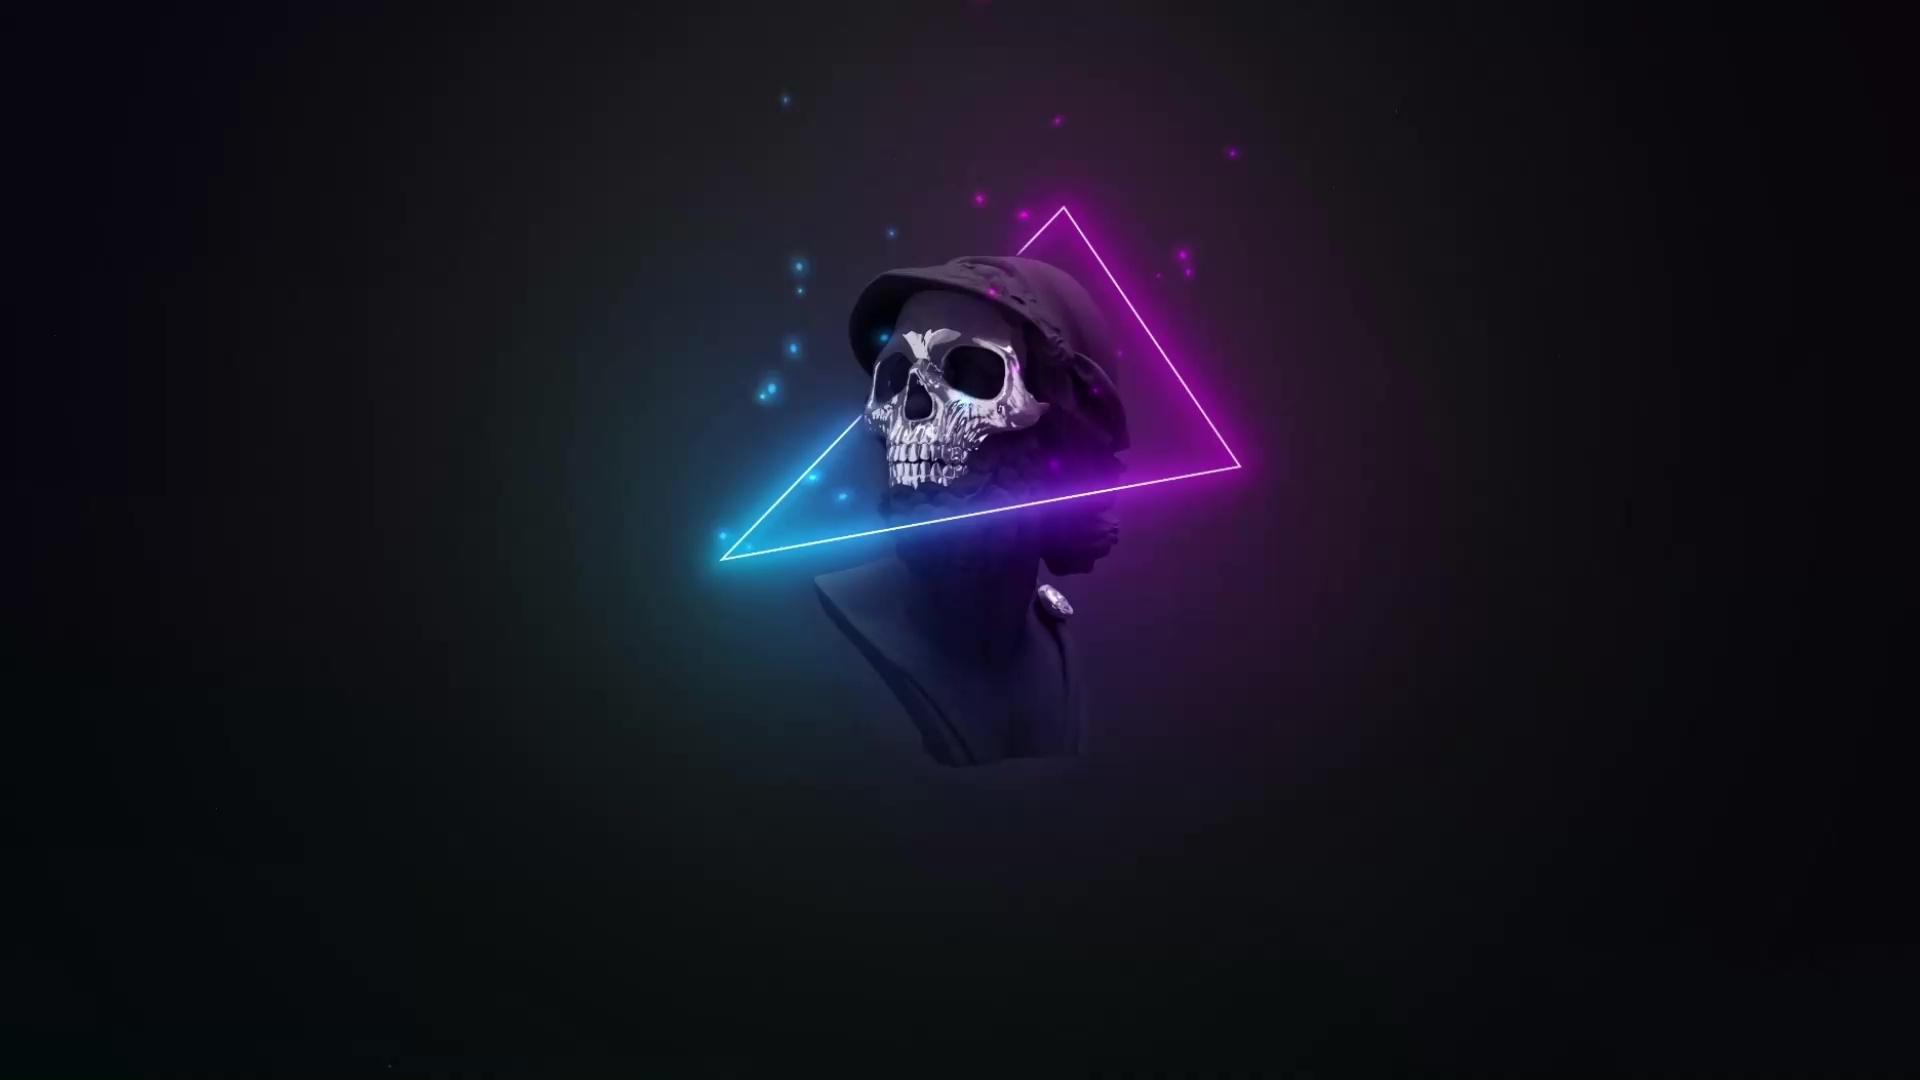 Skull Neon Minimal Live Wallpaper - WallpaperWaifu